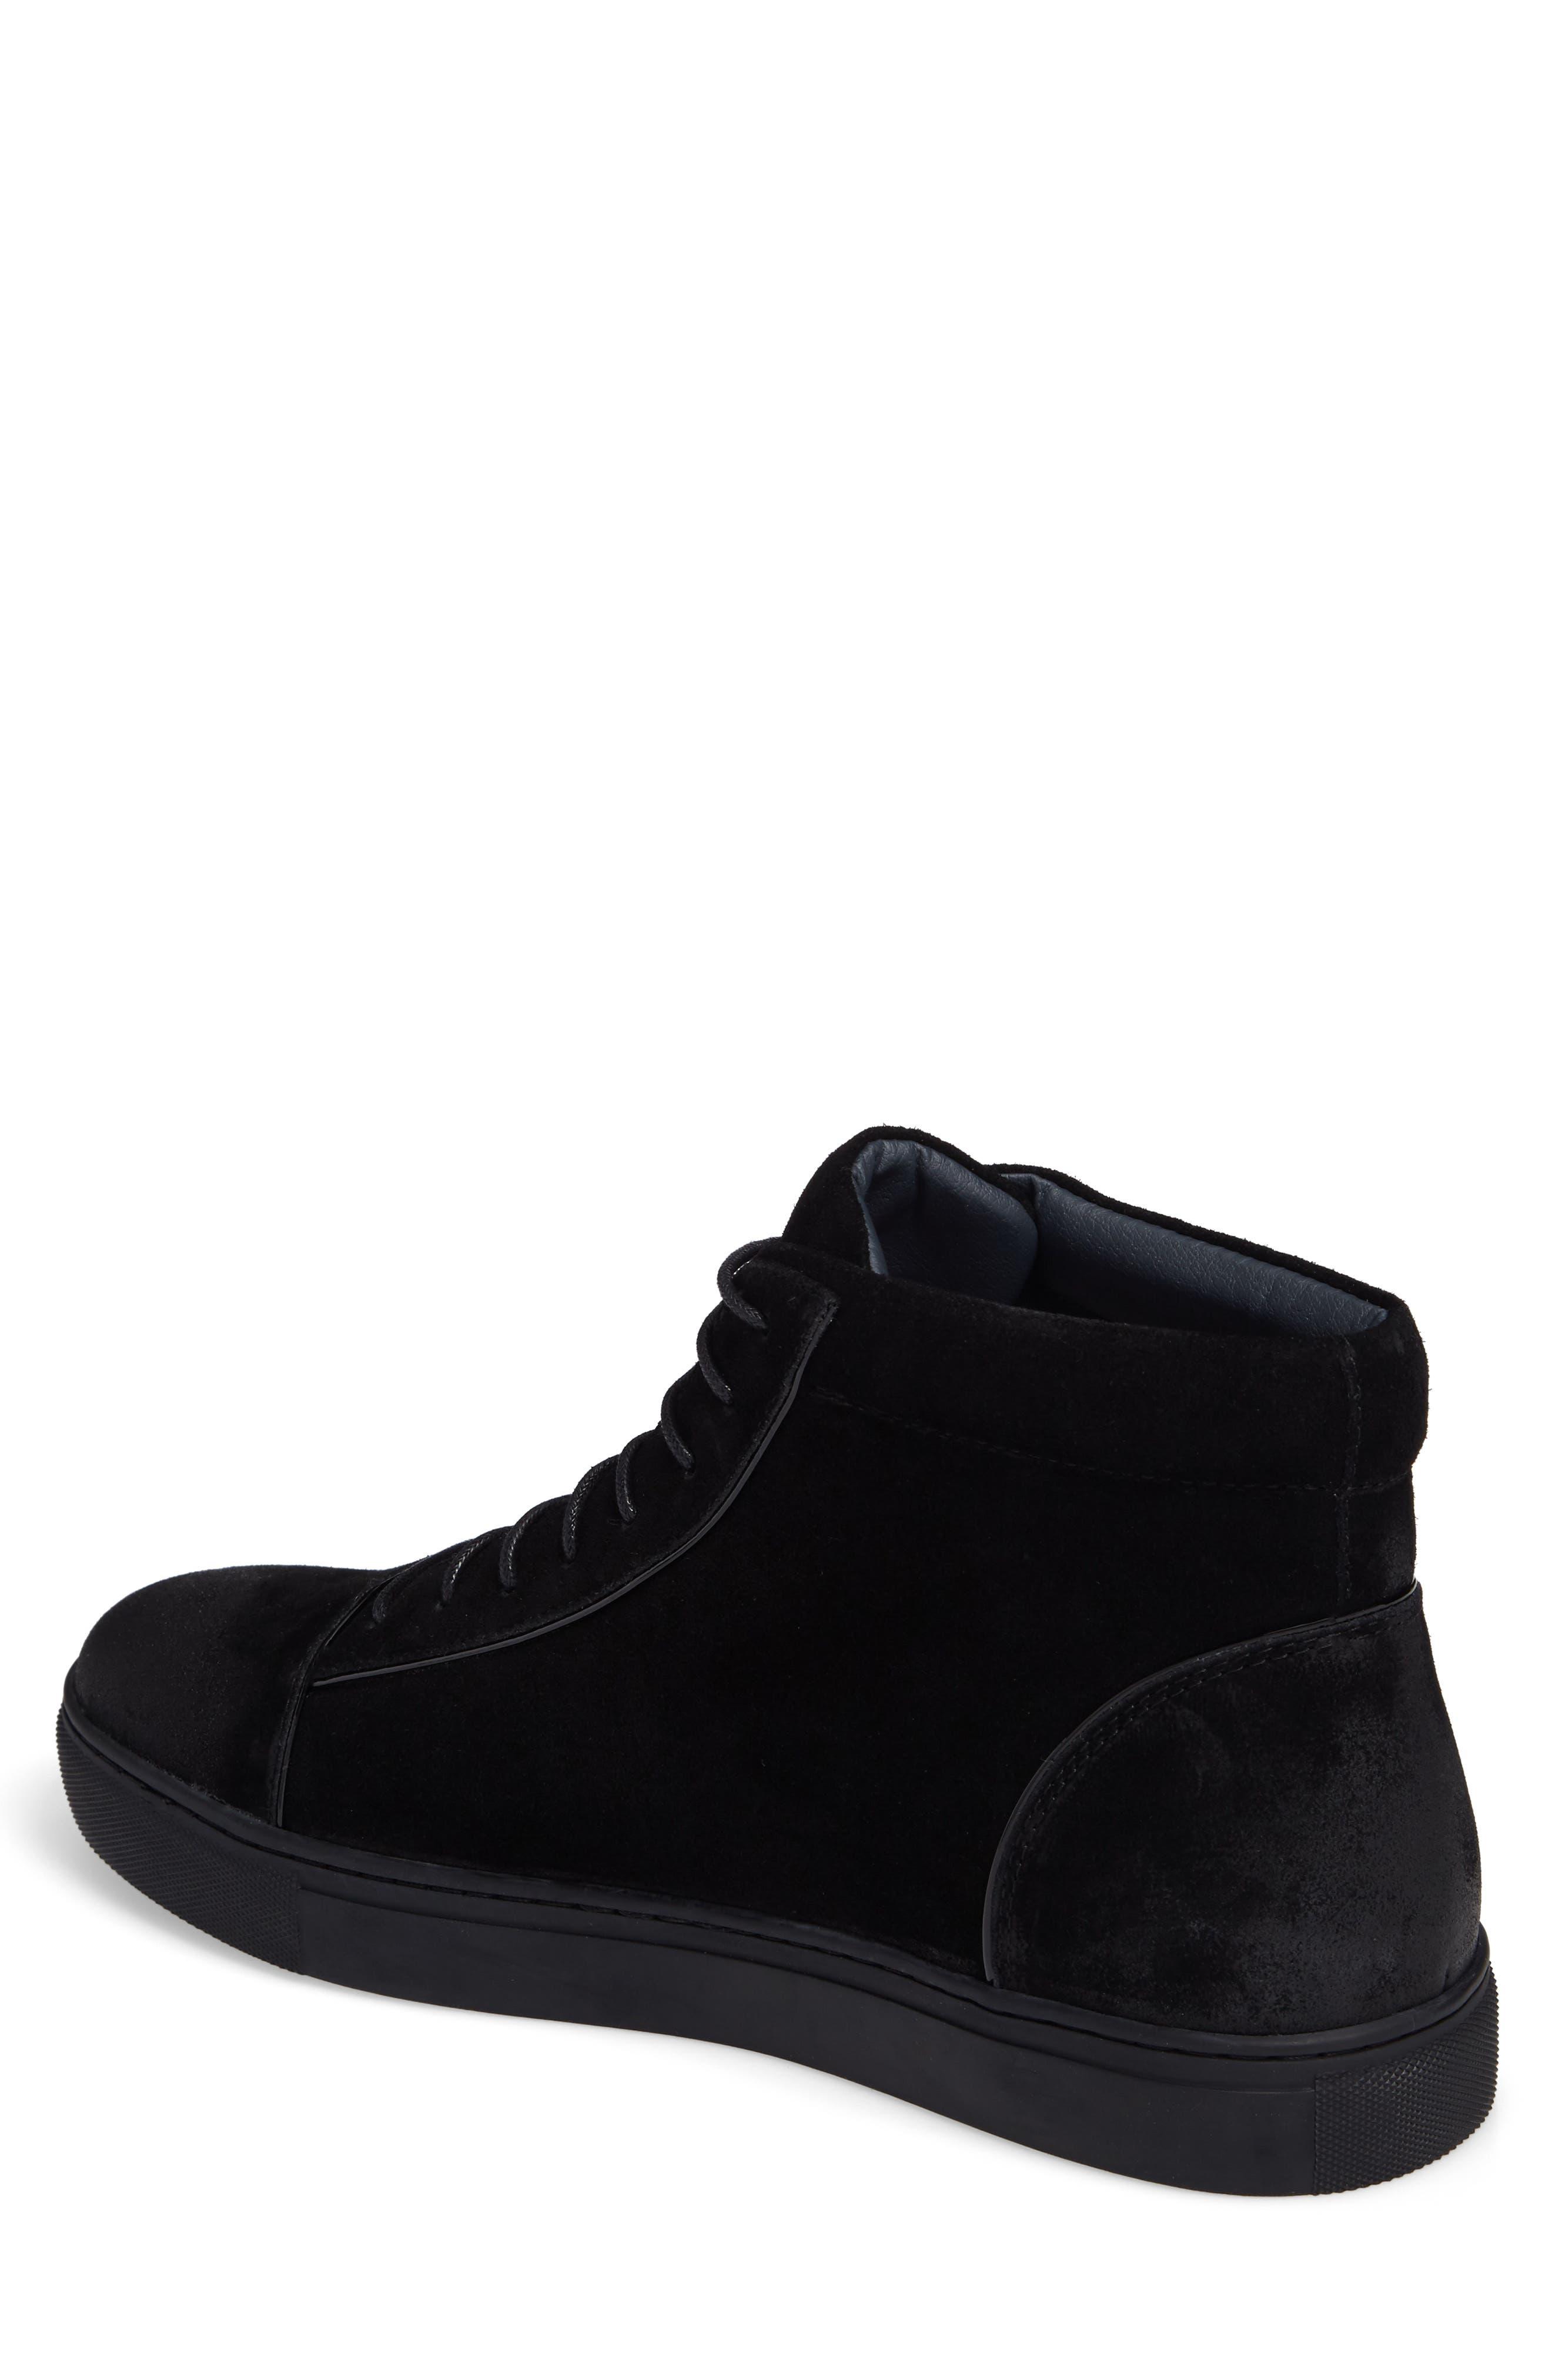 Grundy Sneaker,                             Alternate thumbnail 2, color,                             Black Suede